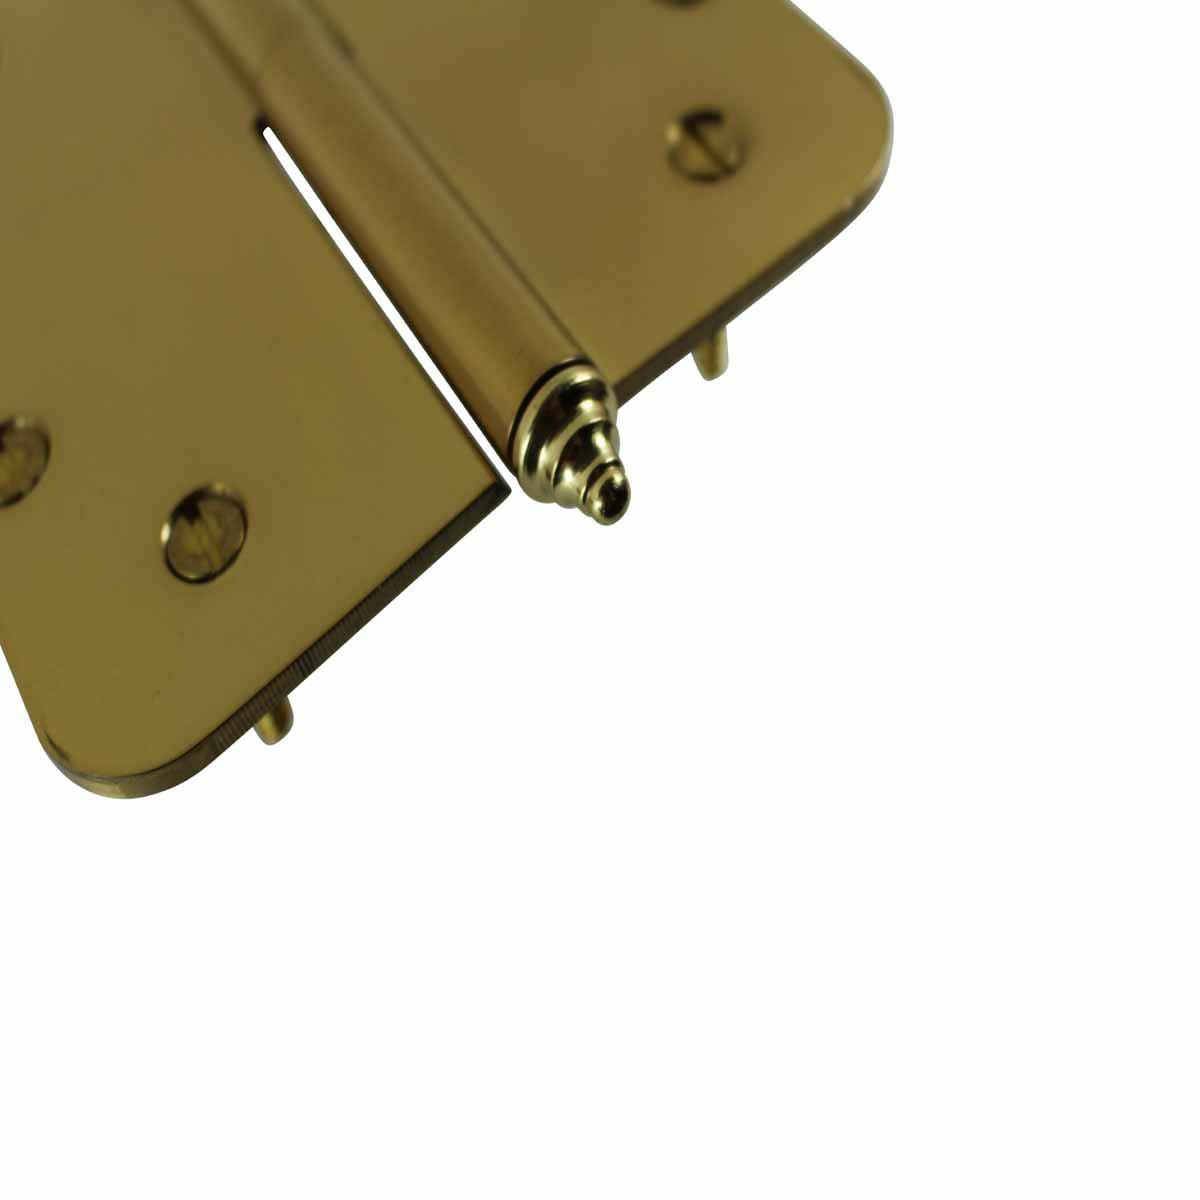 5 inch Lift Off Right Brass Door Hinge Radius Decor Tip Door Hinges Door Hinge Solid Brass Hinge